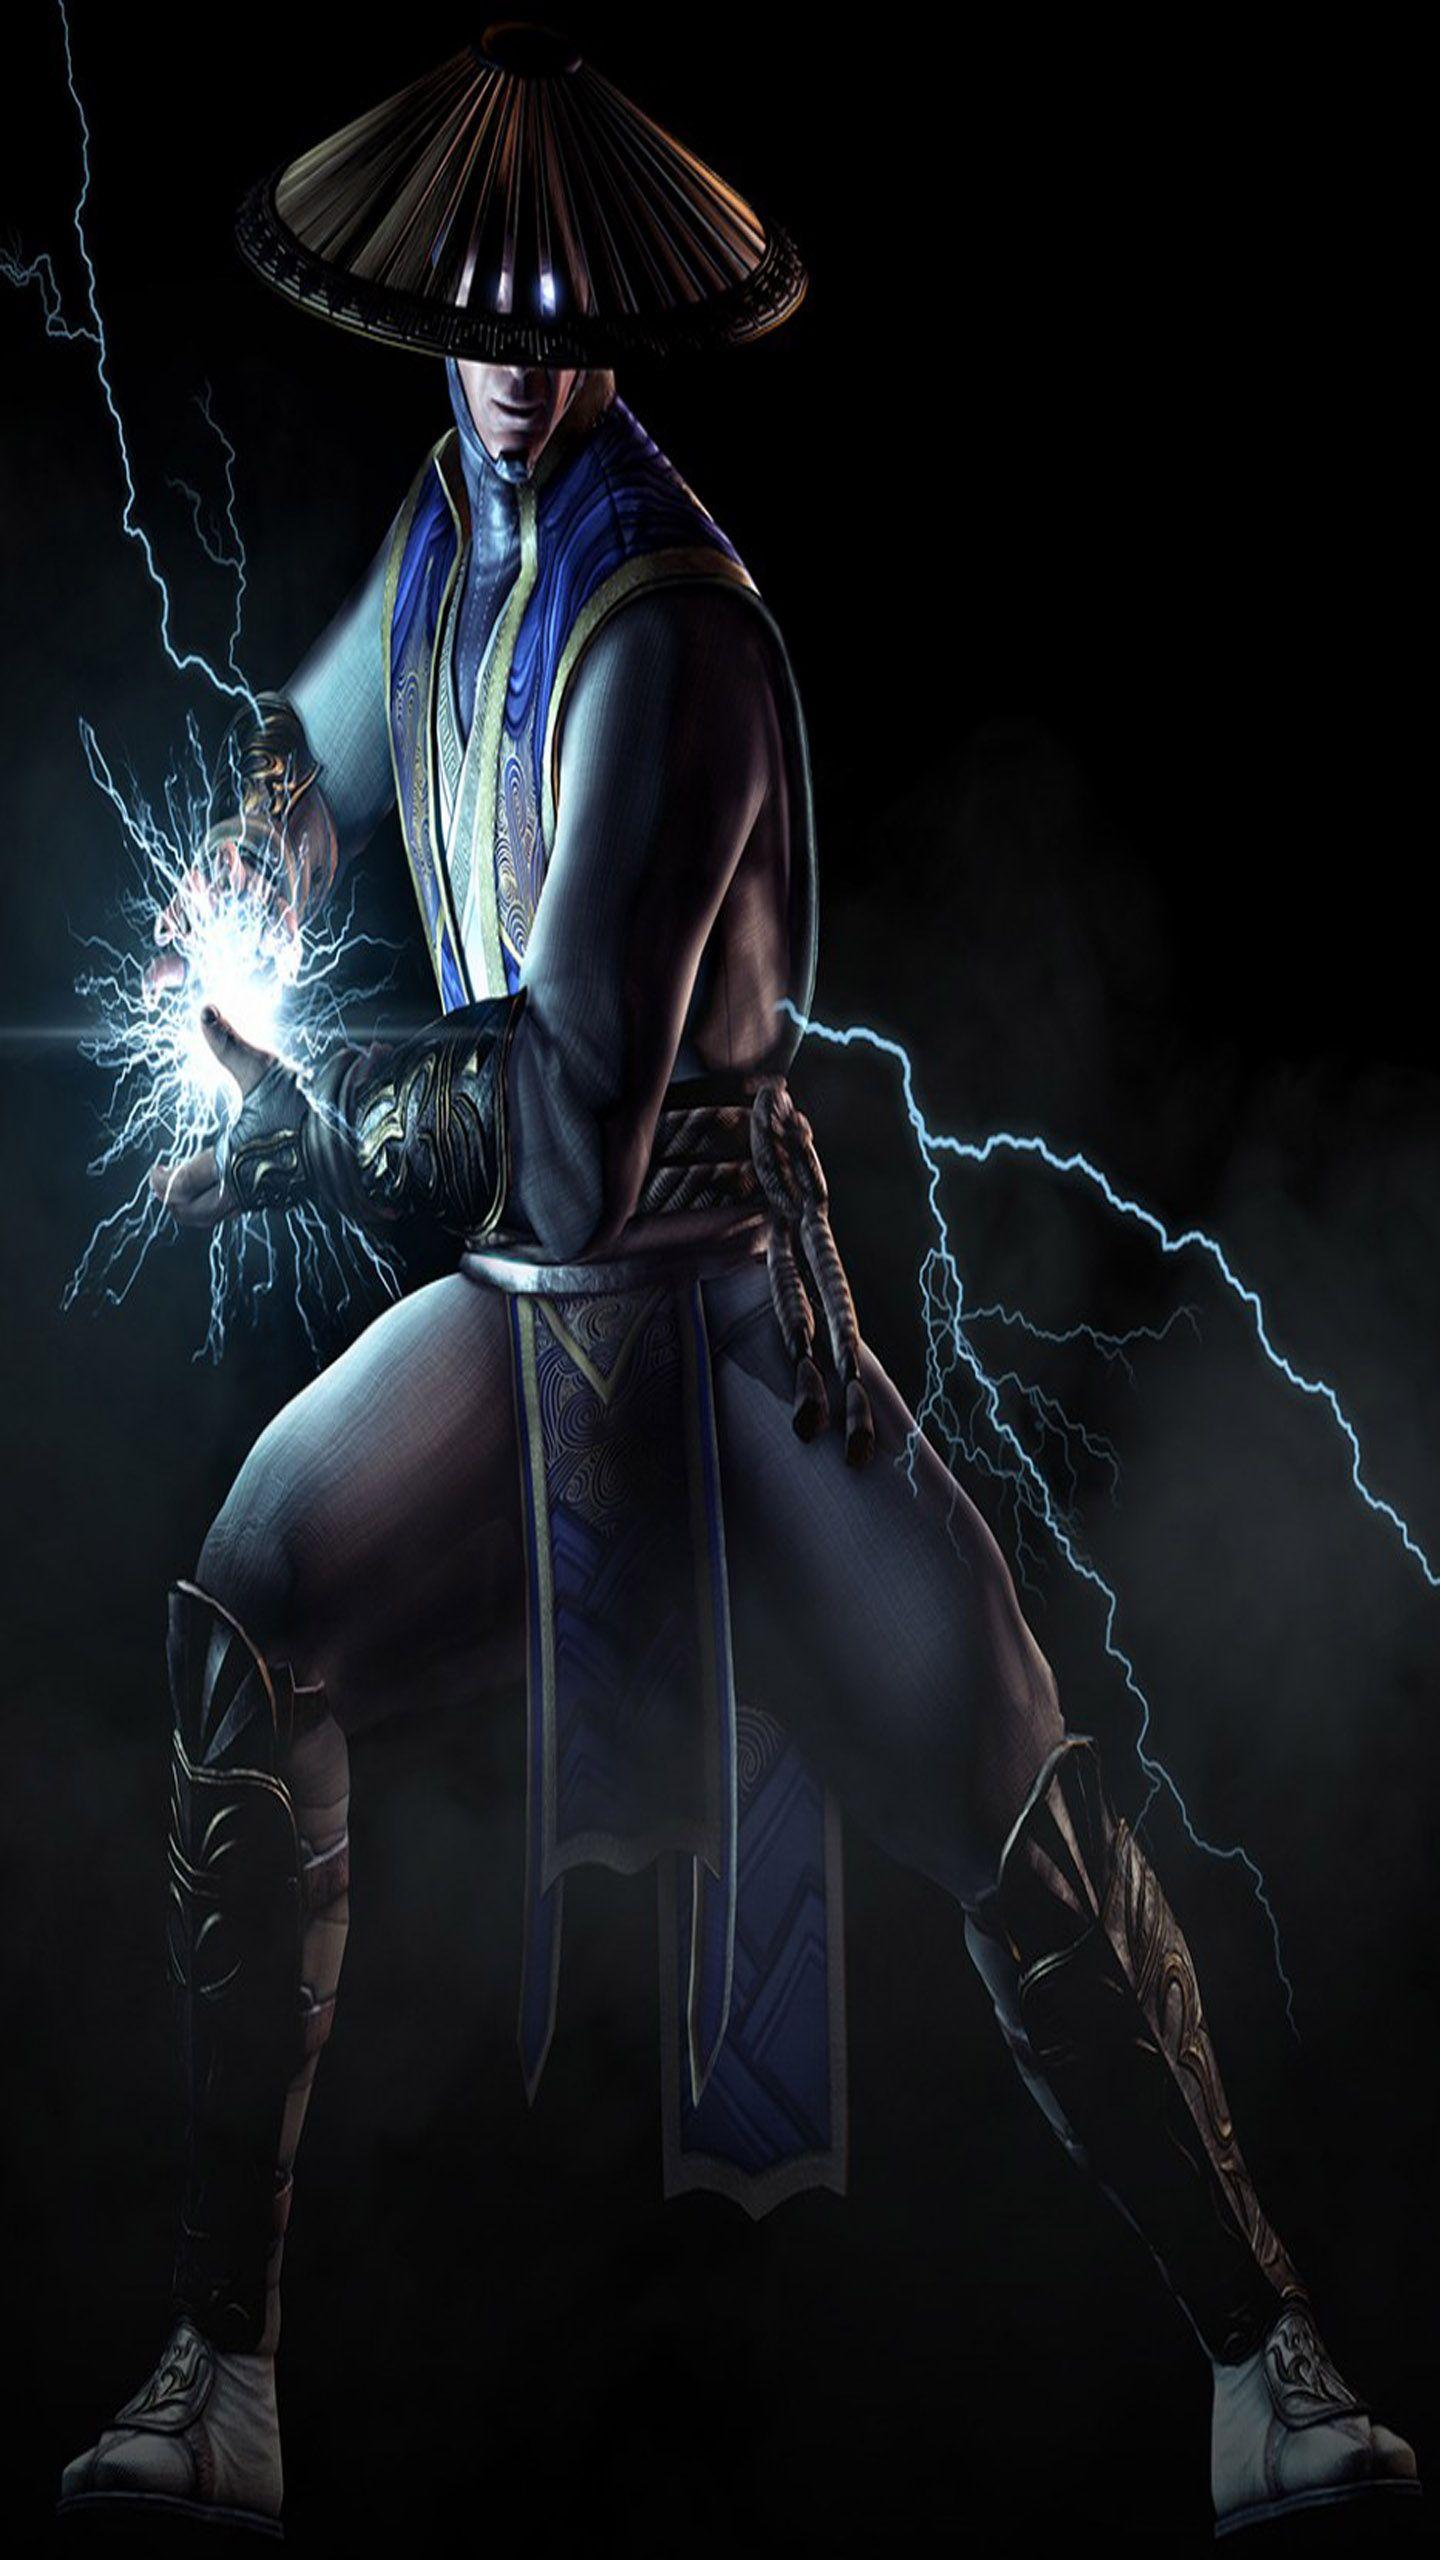 Mortal Kombat X Game Wallpaper For Samsung Galaxy S6 Mortal Kombat X Wallpapers Mortal Kombat X Raiden Mortal Kombat